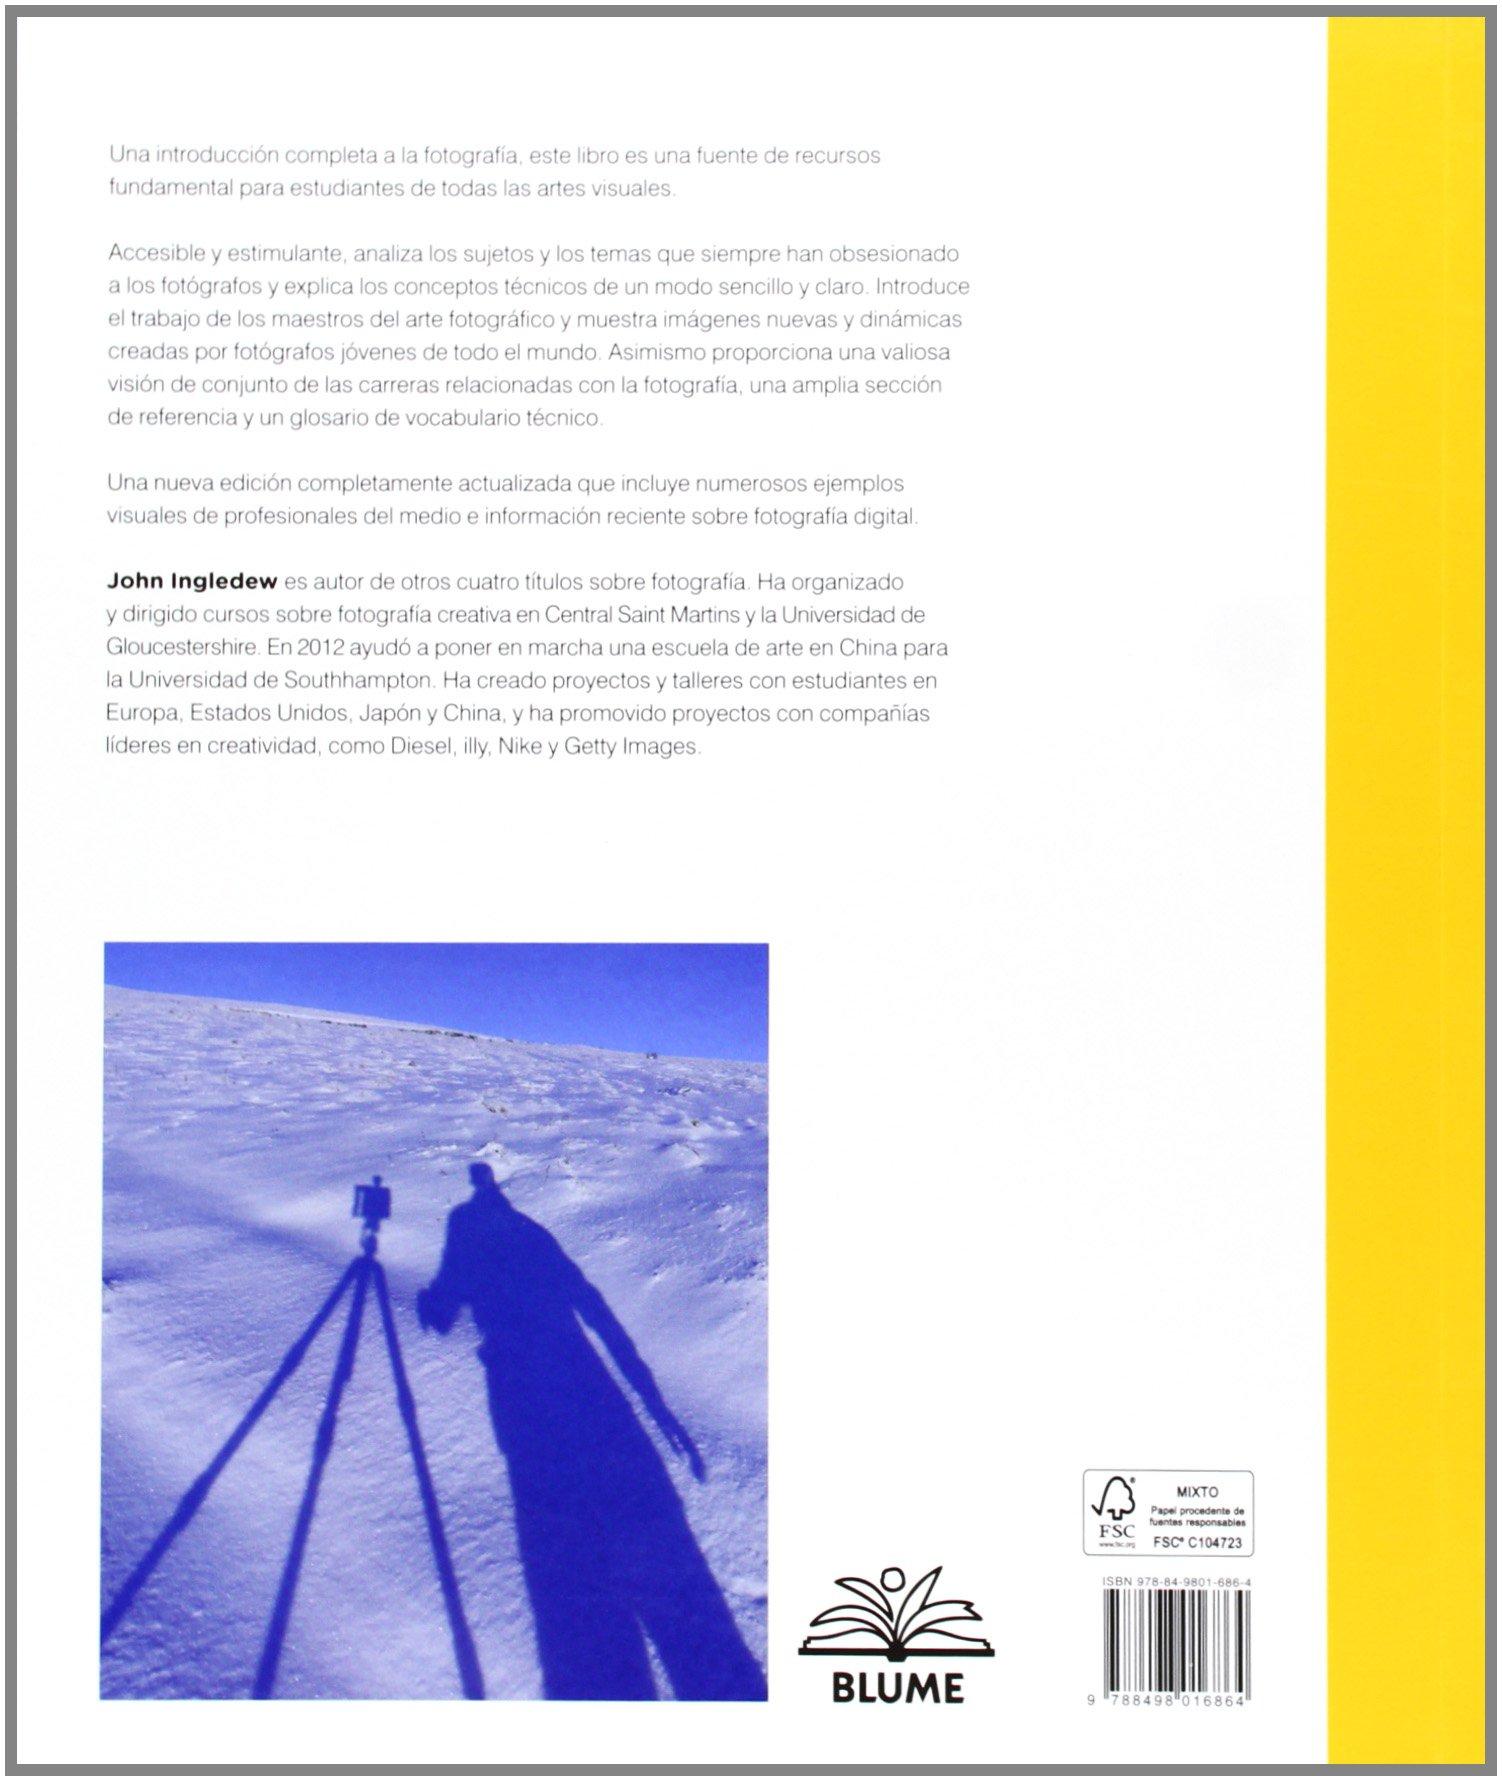 Fotografía (Blume Fotografia): Amazon.es: John Ingledew, Cristina Rodríguez Fischer, Francisco Rosés Martínez: Libros